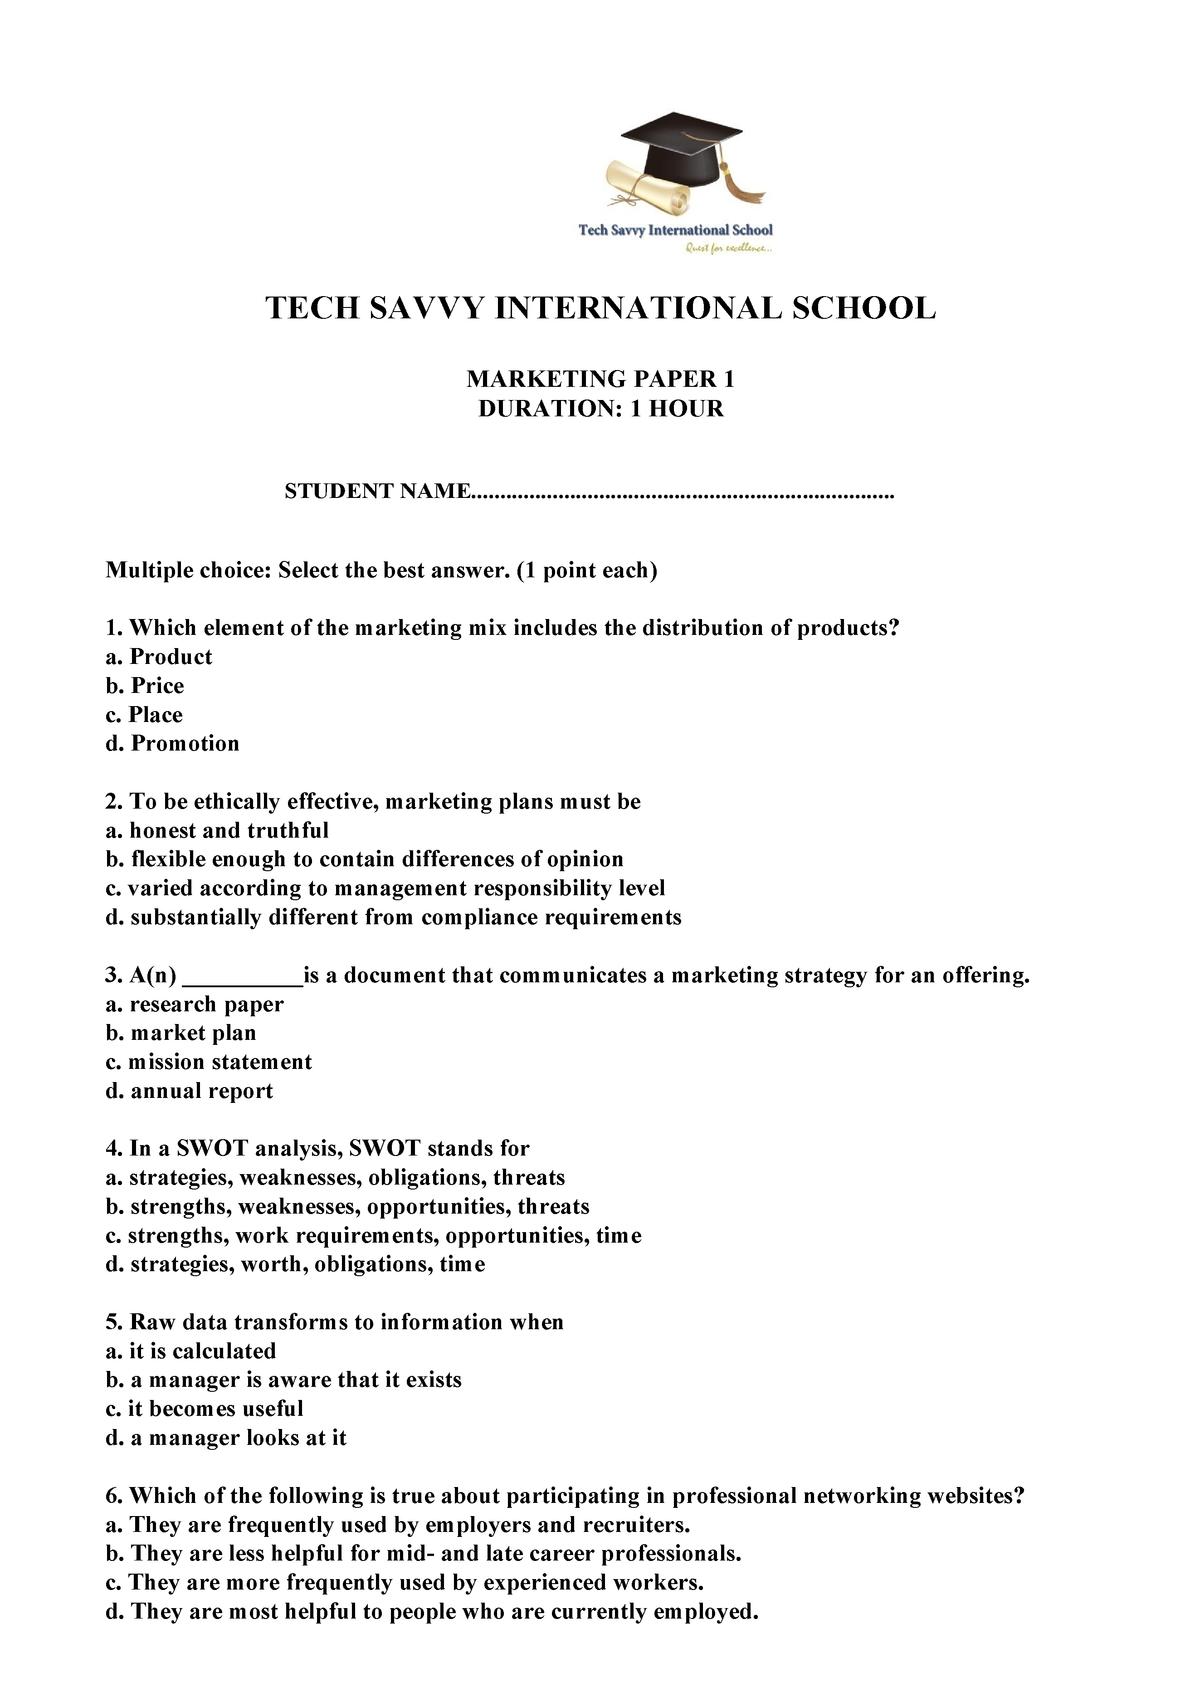 Exam 2019 - COS1521: Computer Systems: Fundamental Concepts